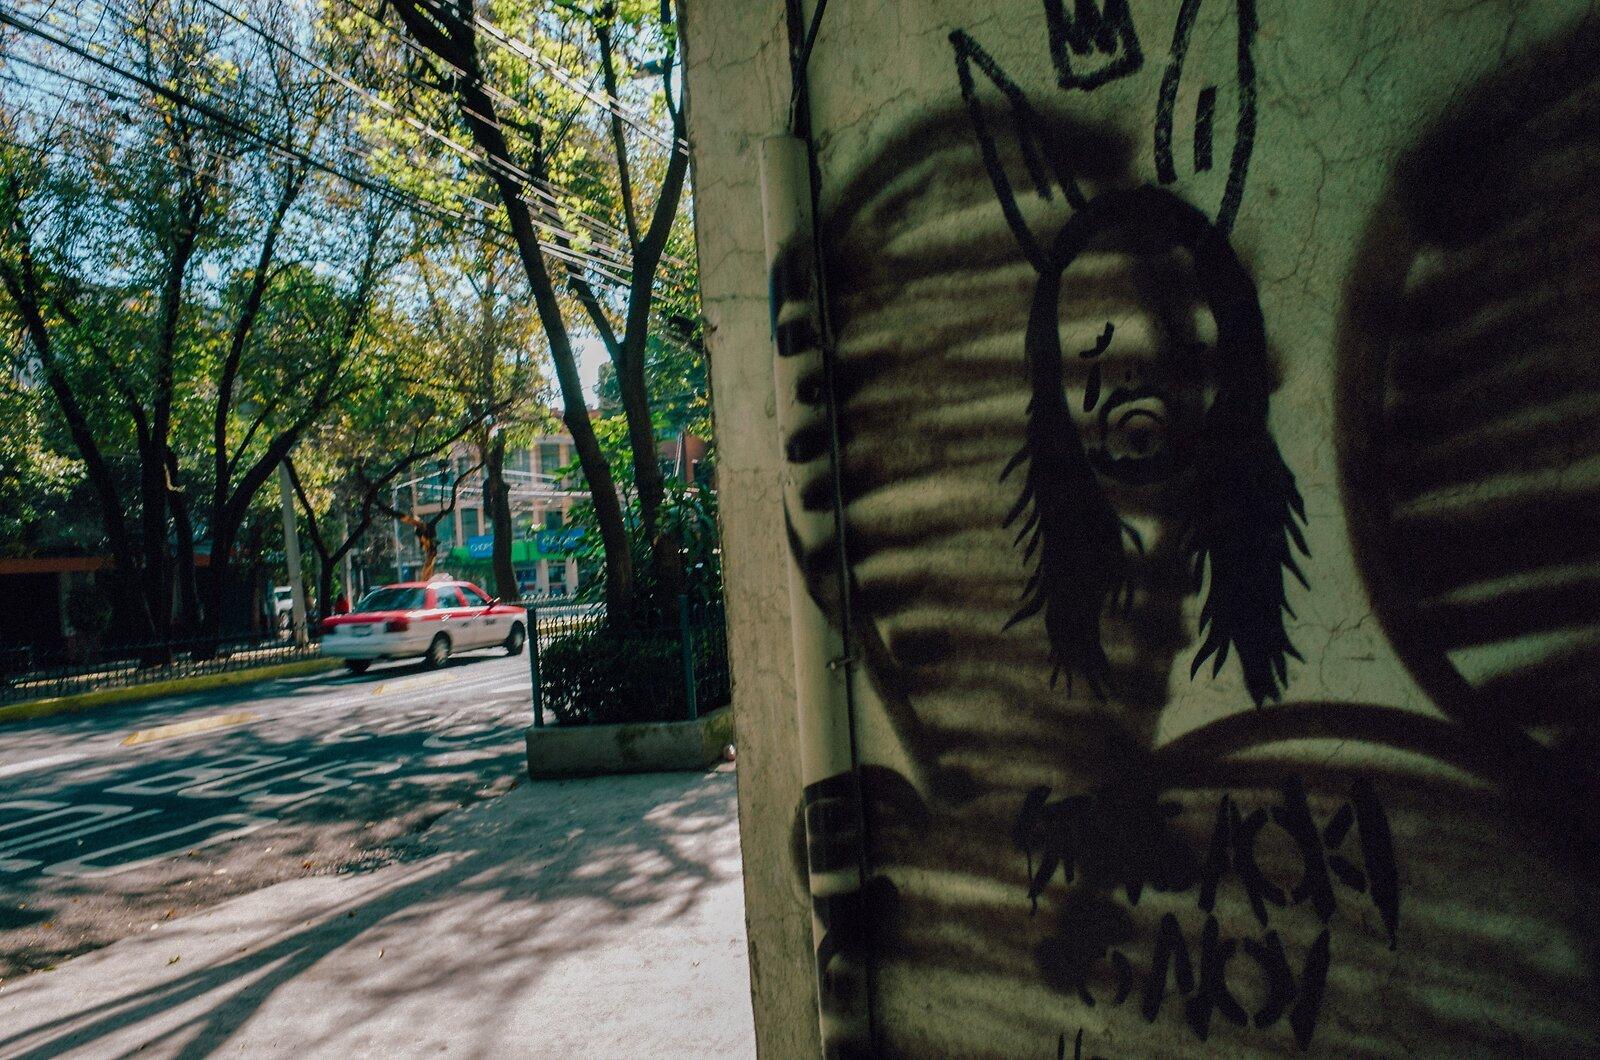 GRII_Dec5_Street_Art_La_Condesa_MX.jpg